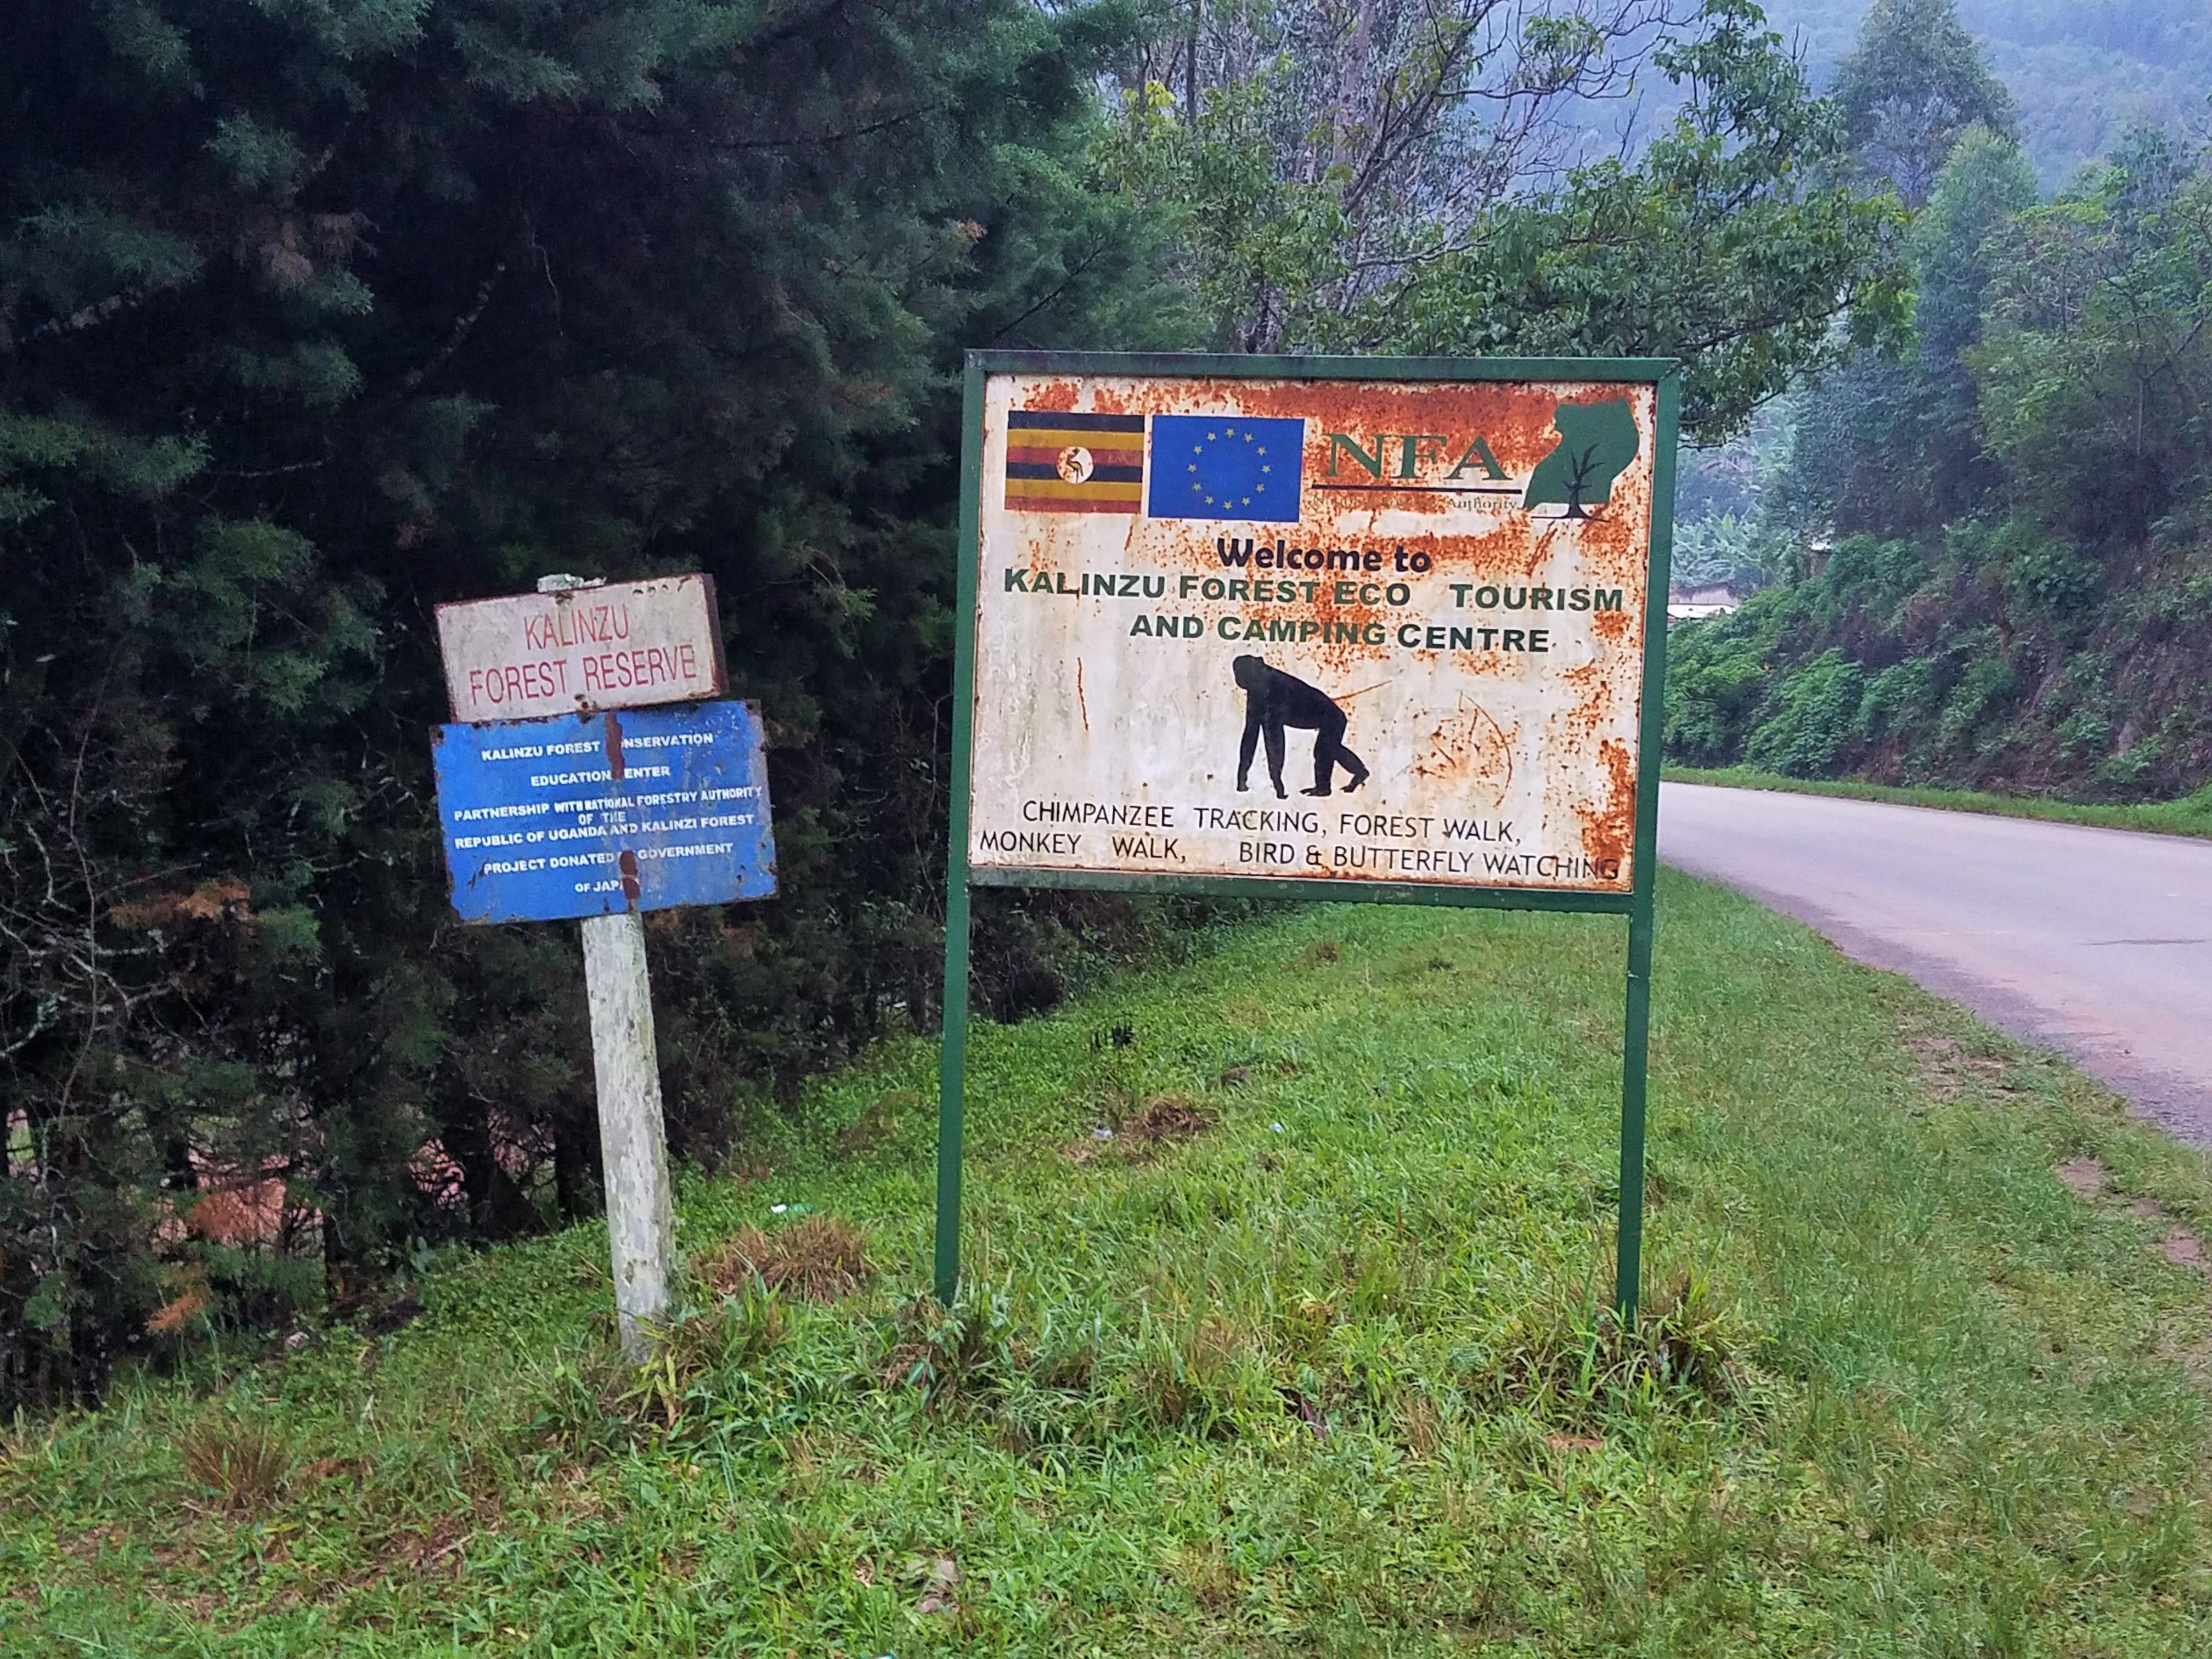 safari, Uganda, Red Chili, Chimp Tracking, Kalinzu Forrest, eco-tourism